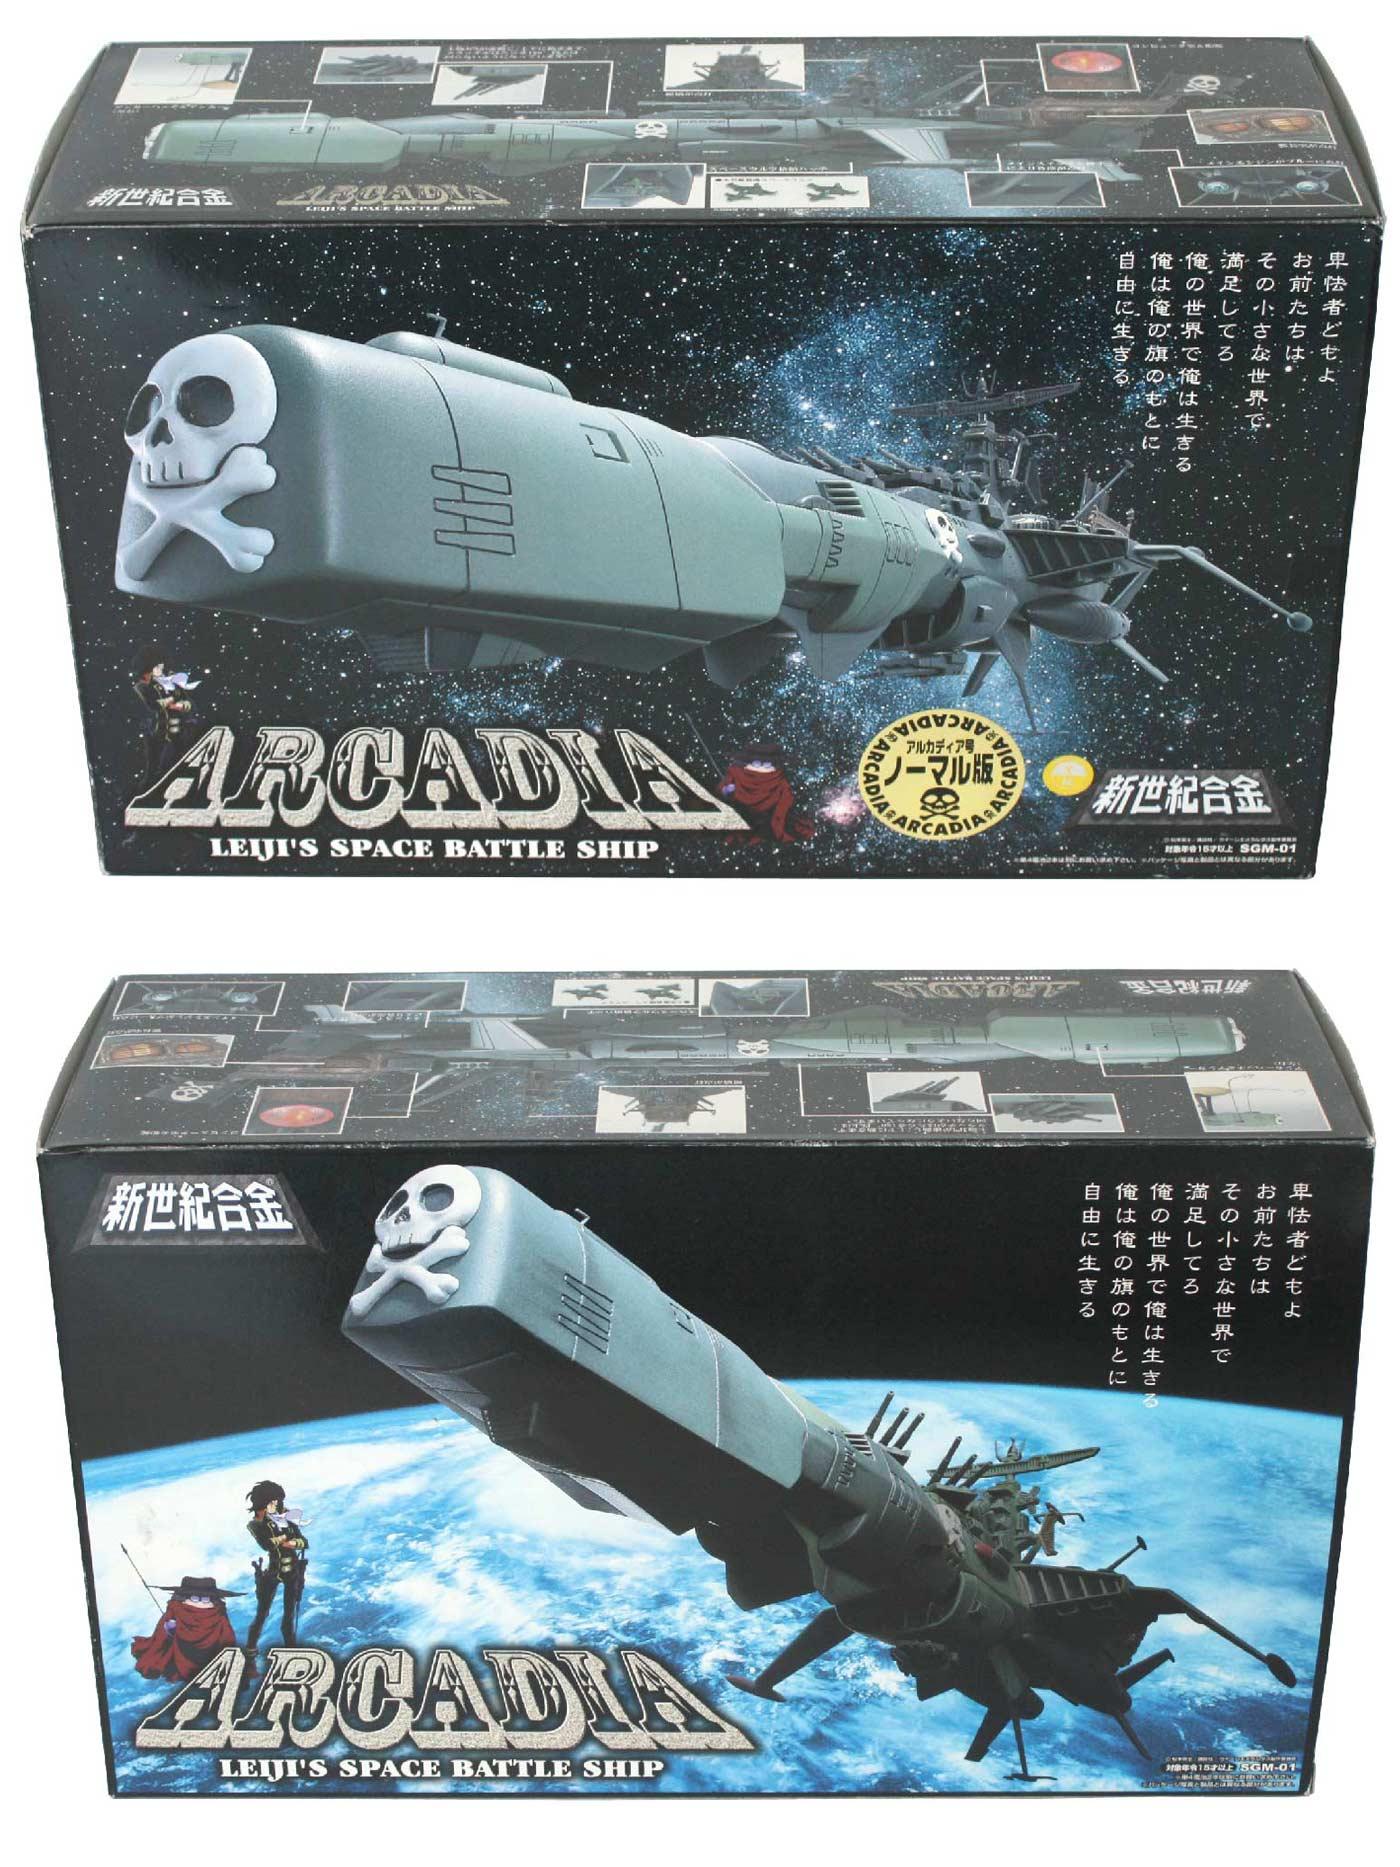 Packaging de l'Arcadia d'Aoshima face et dos